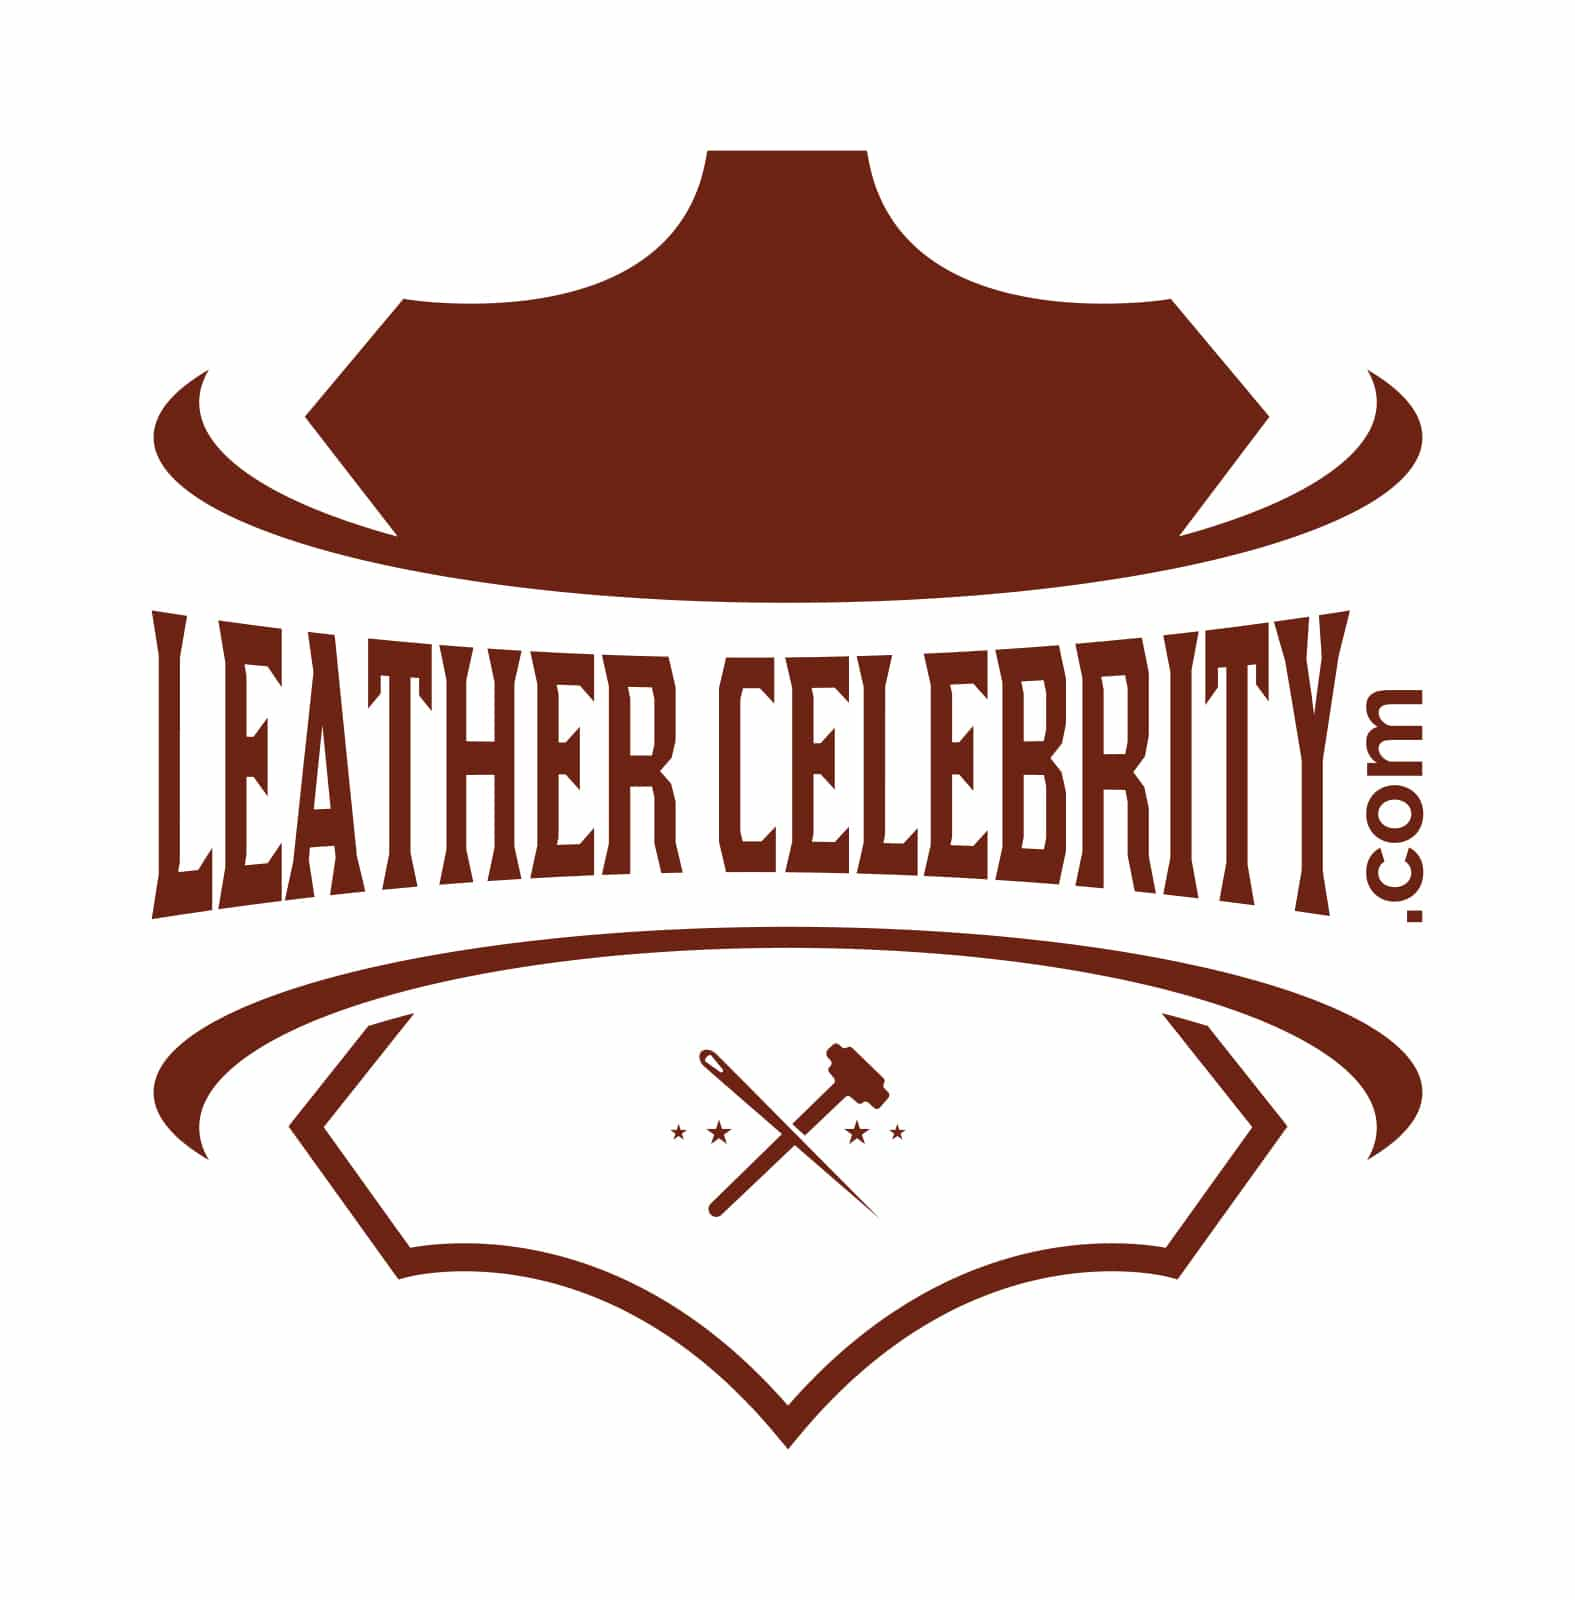 Leather Celebrity